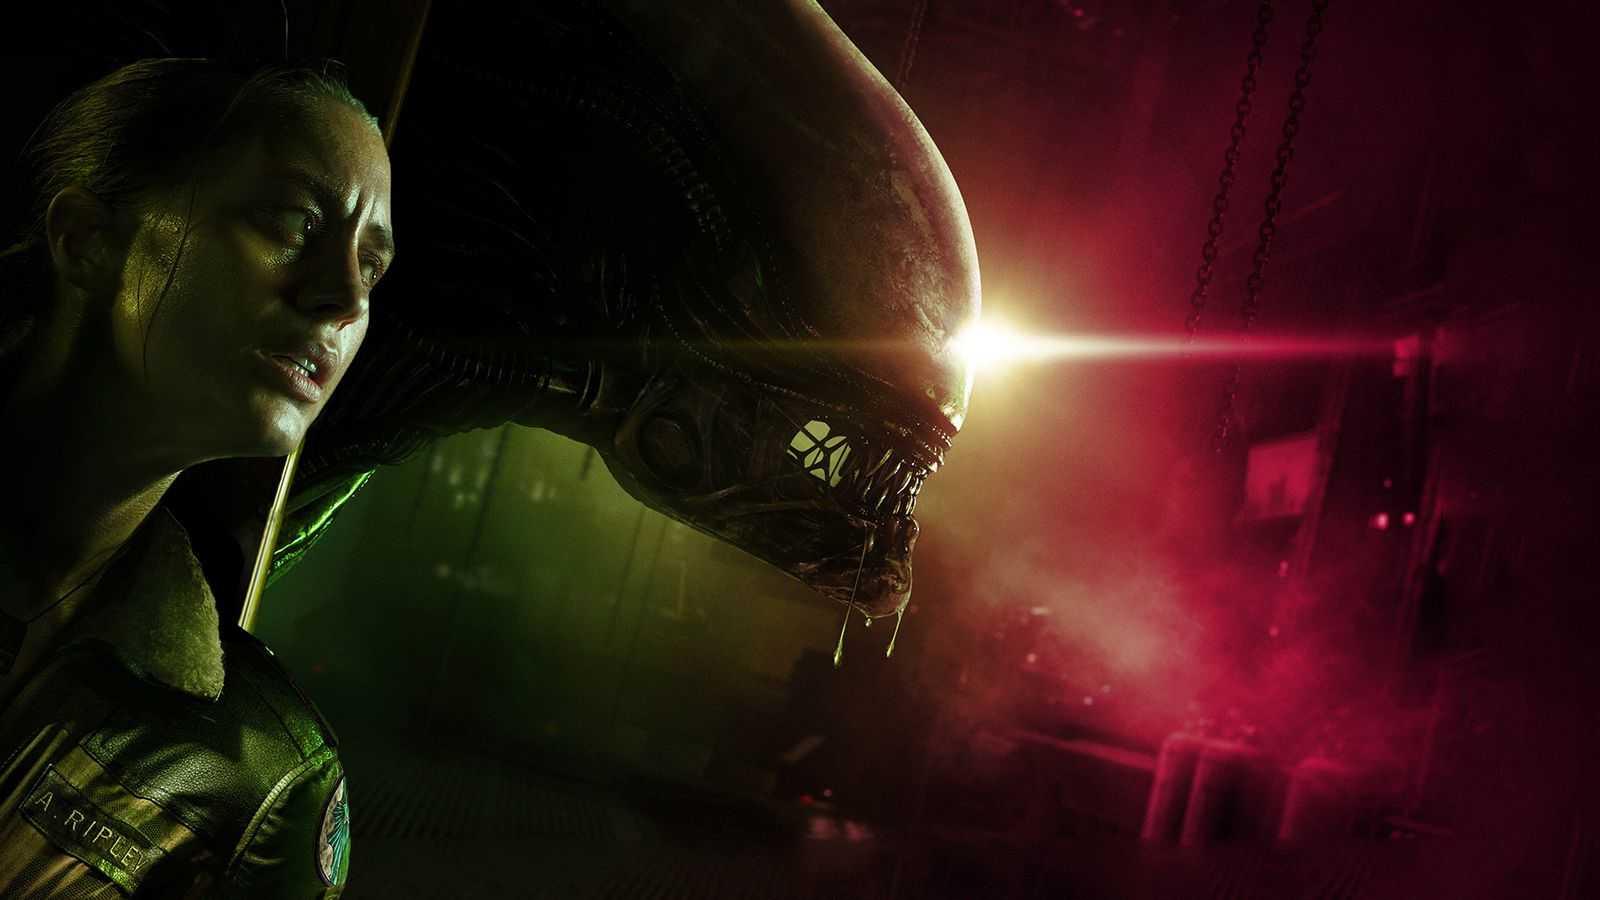 videogame alien